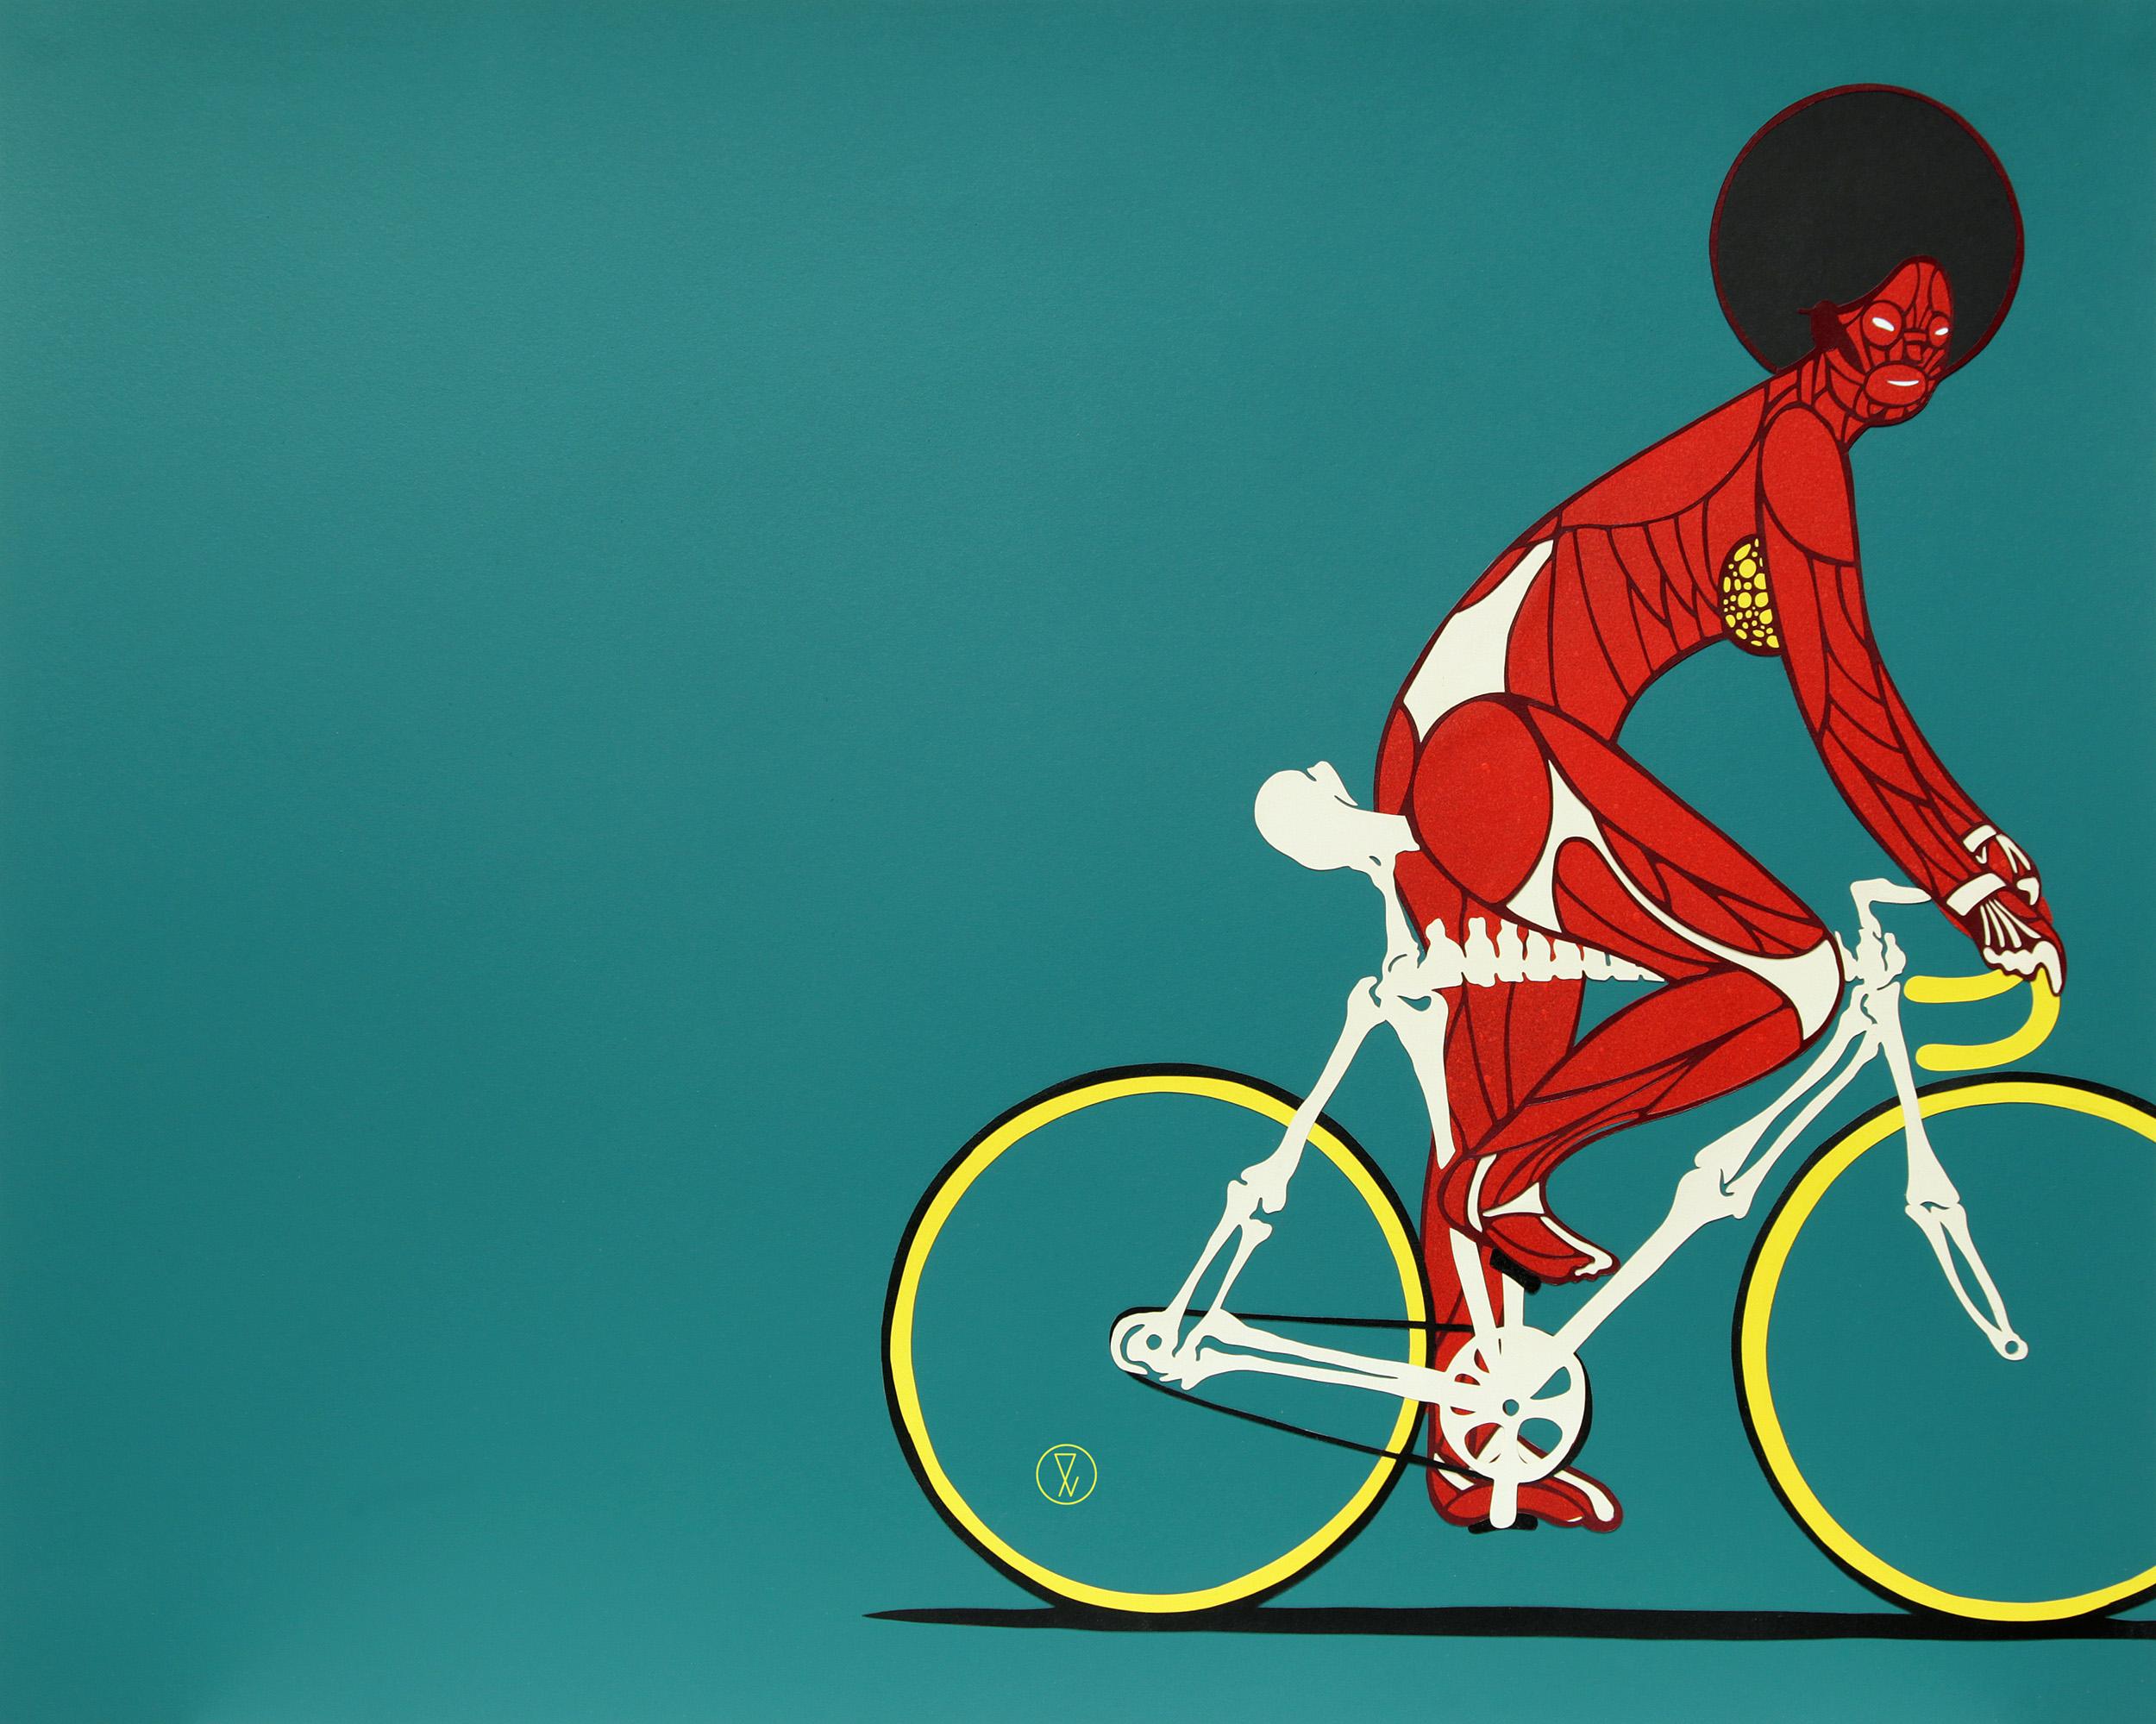 Bone To Ride by Eelus